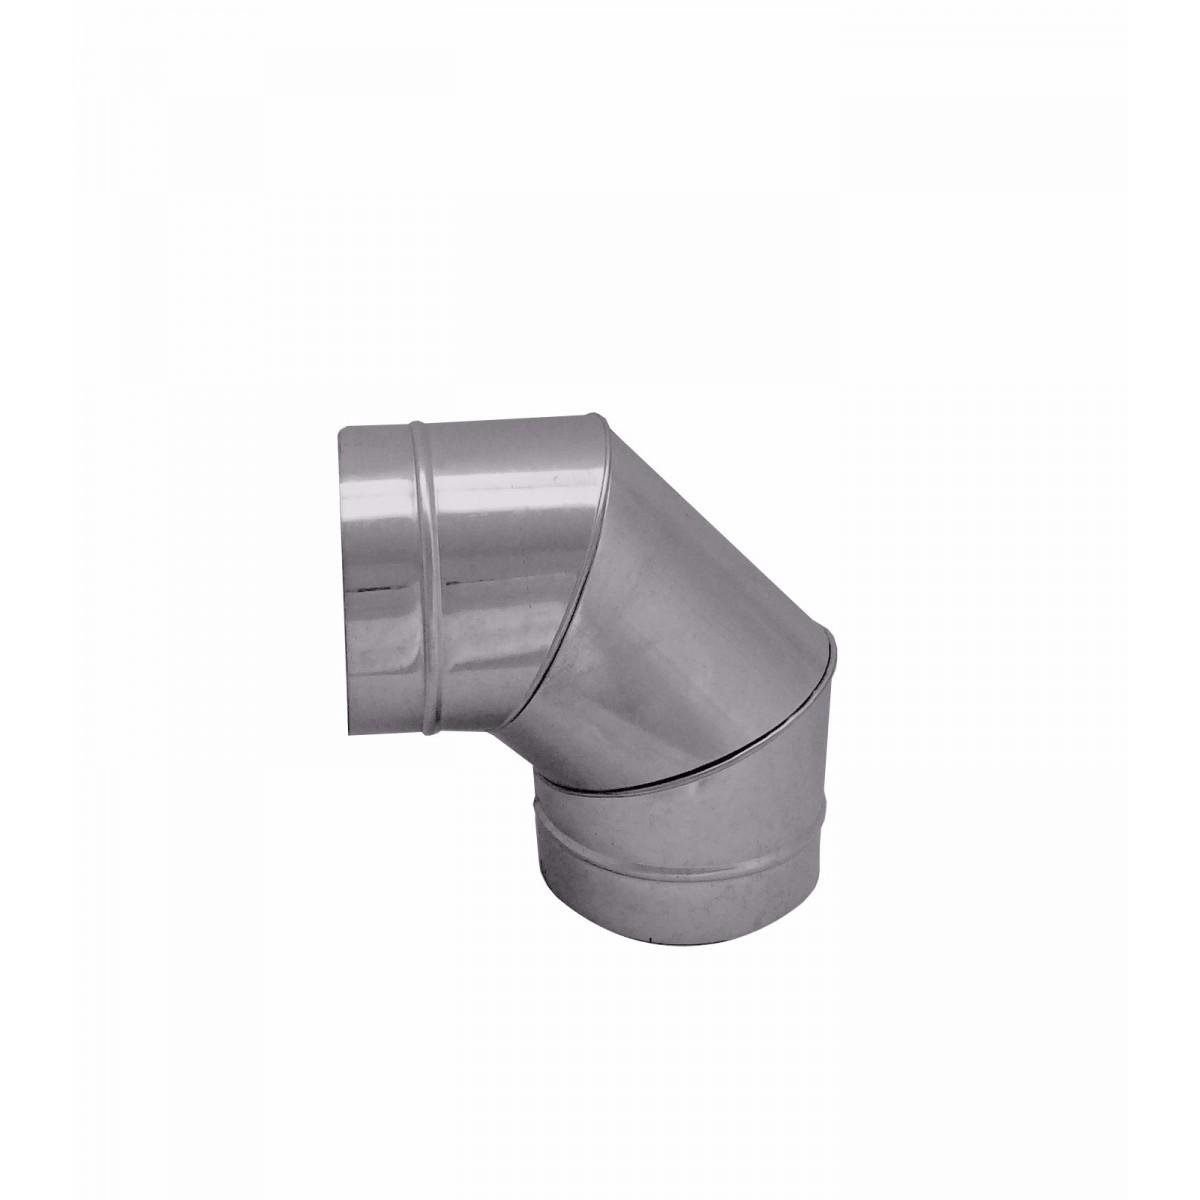 Curva / cotovelo galvanizada 90° de 250 mm de diâmetro  - Galvocalhas